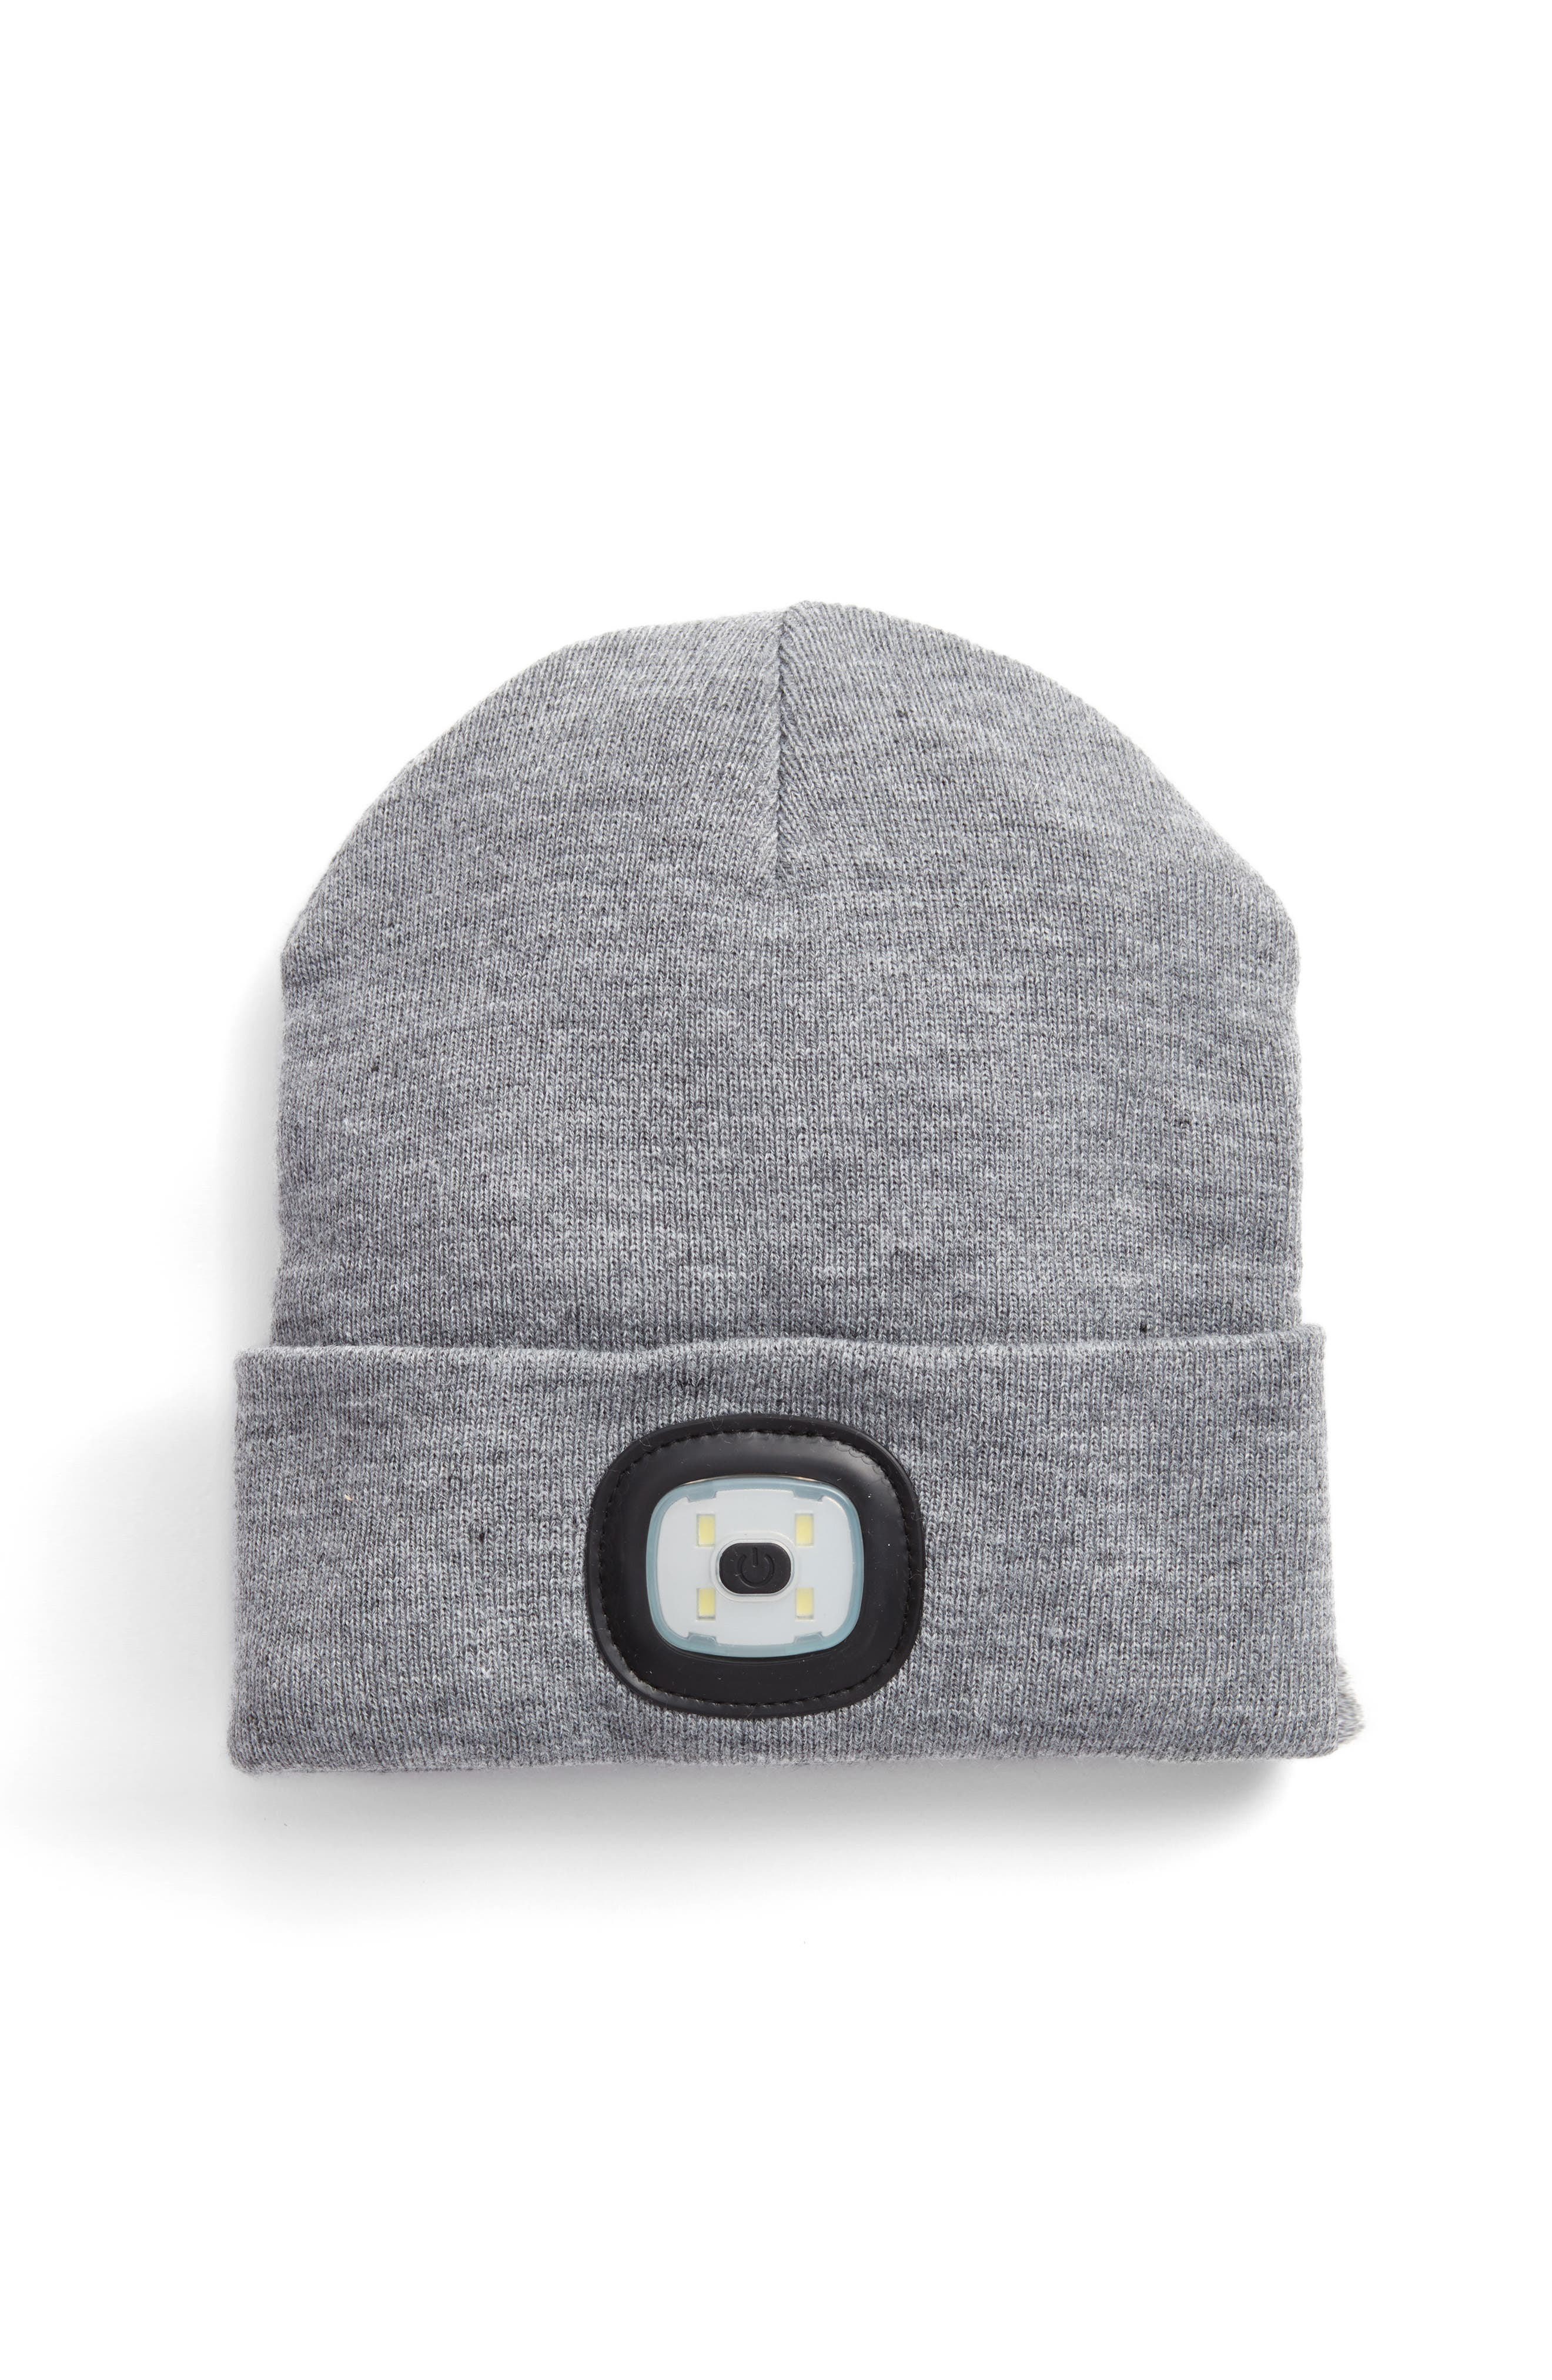 MoMA Design Store X-Cap Light Up Hat